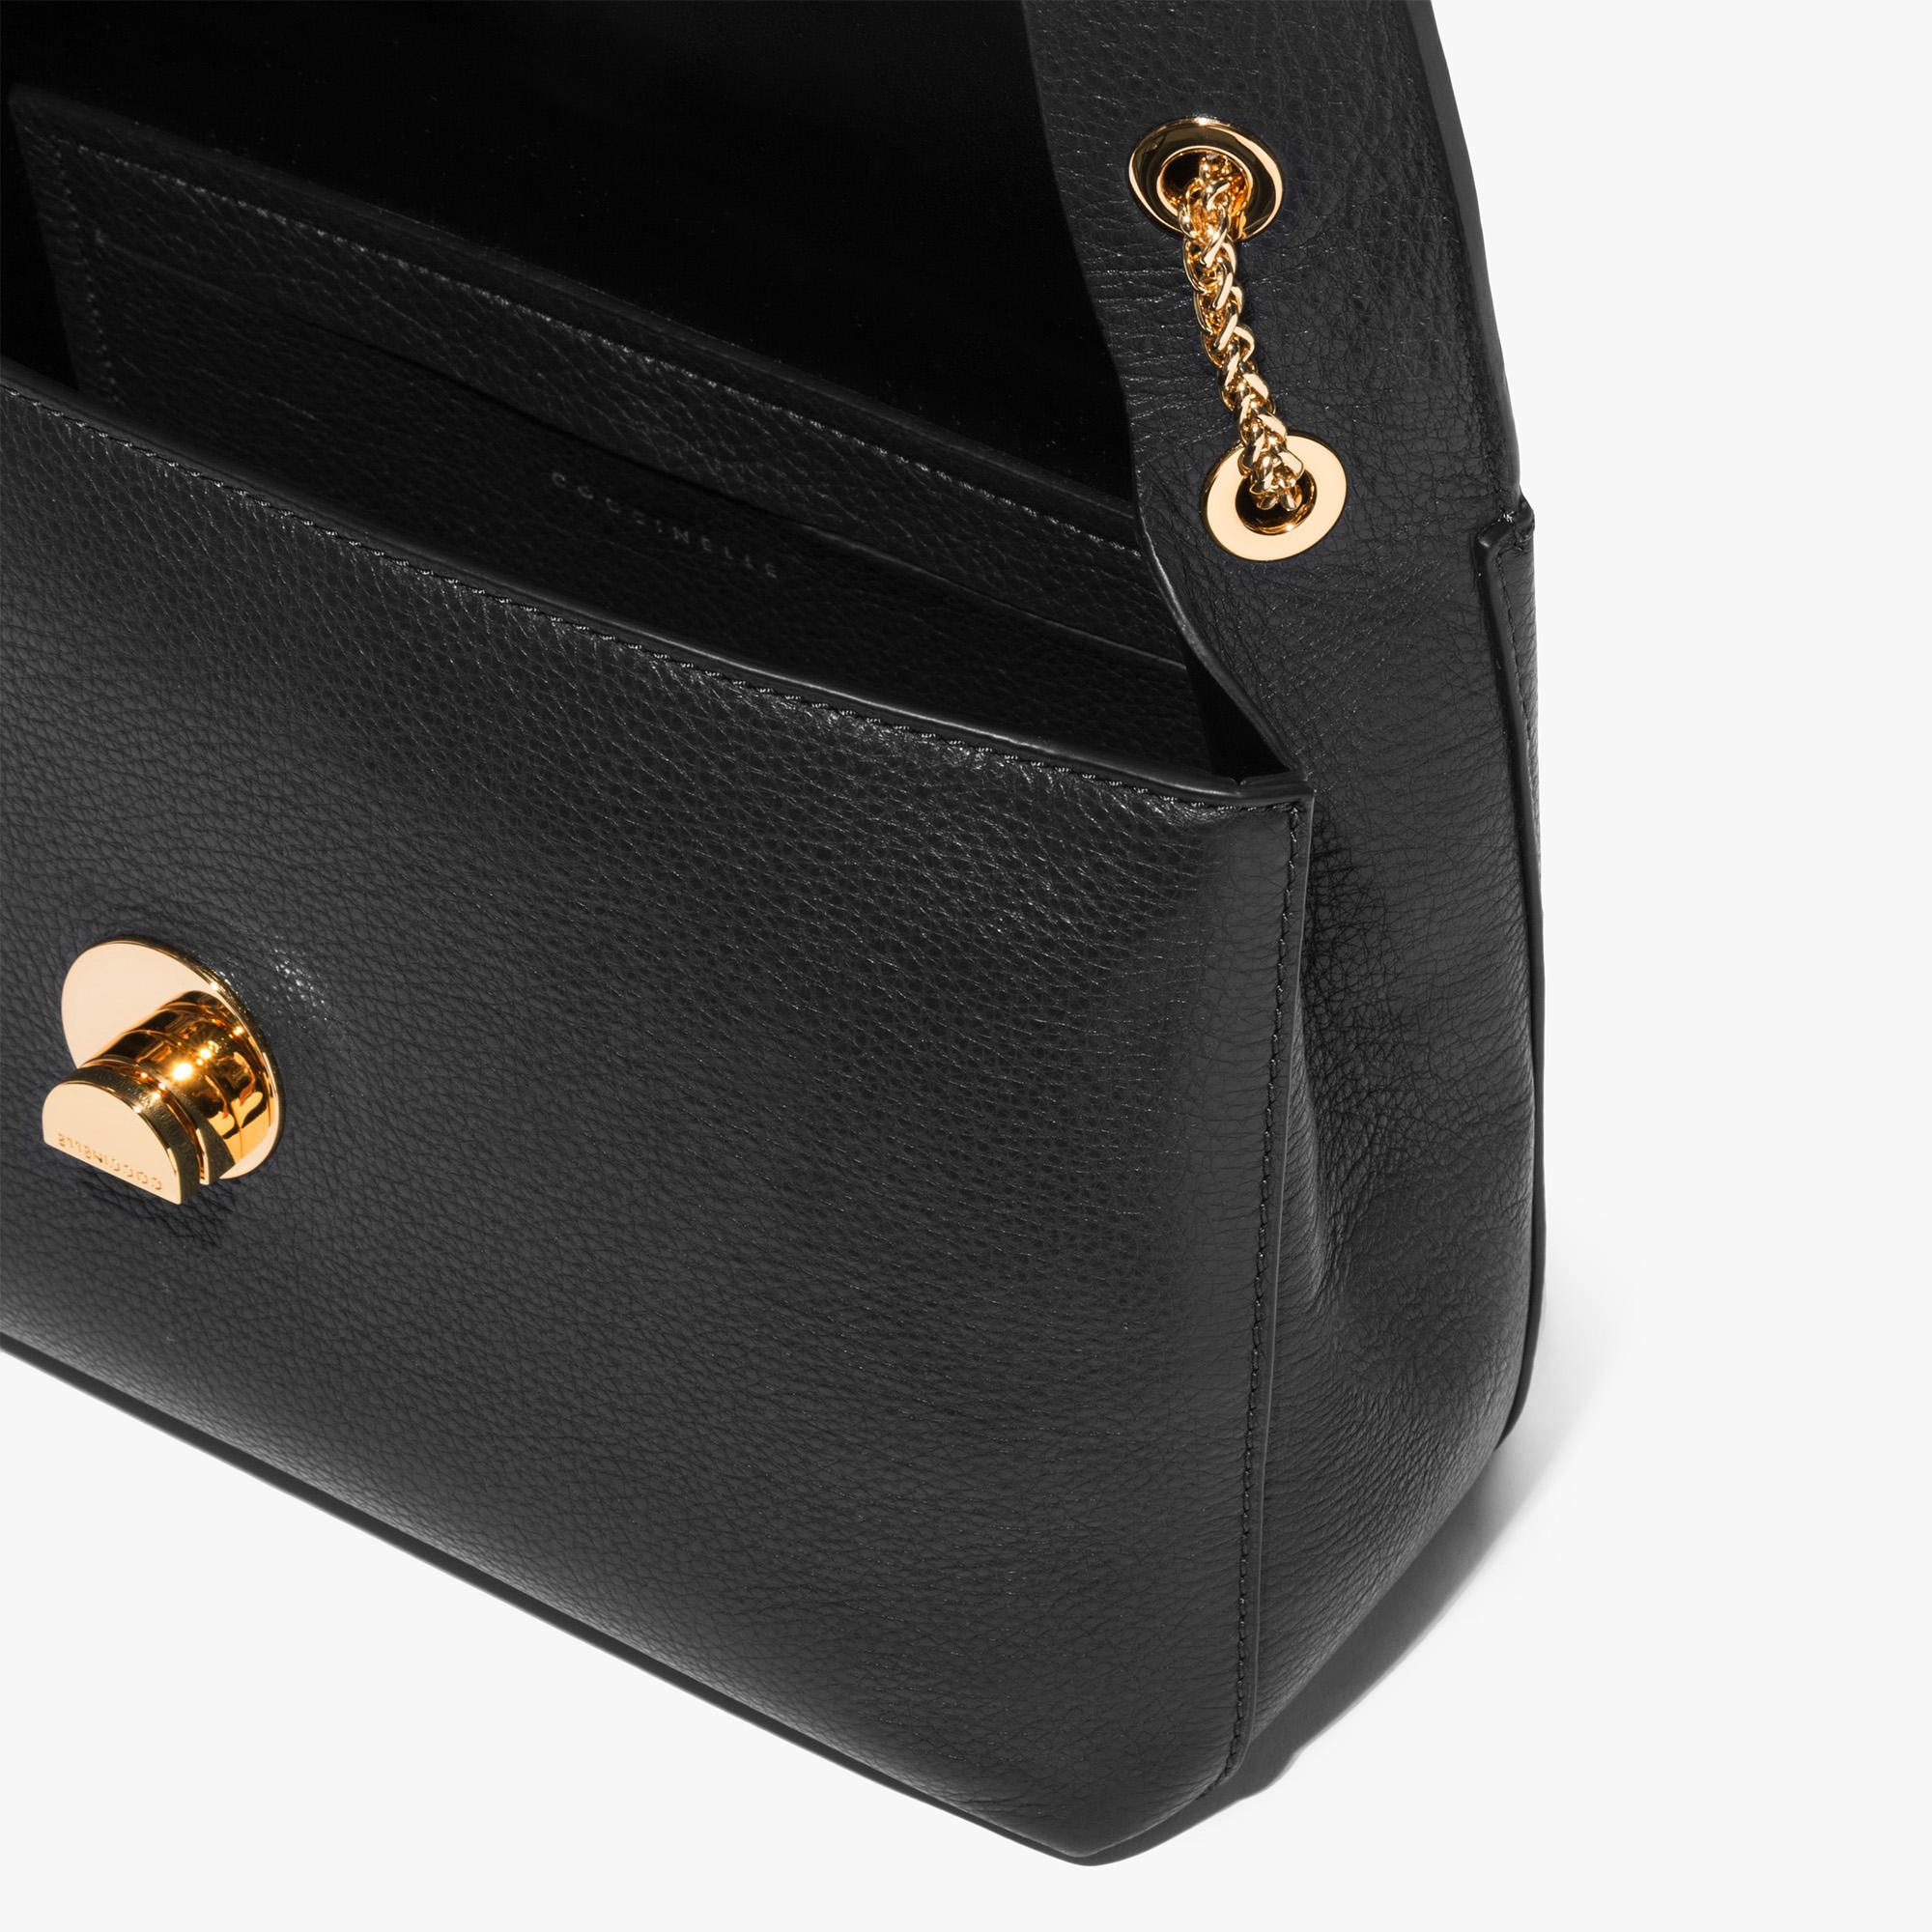 Coccinelle Liya leather cross-body bag